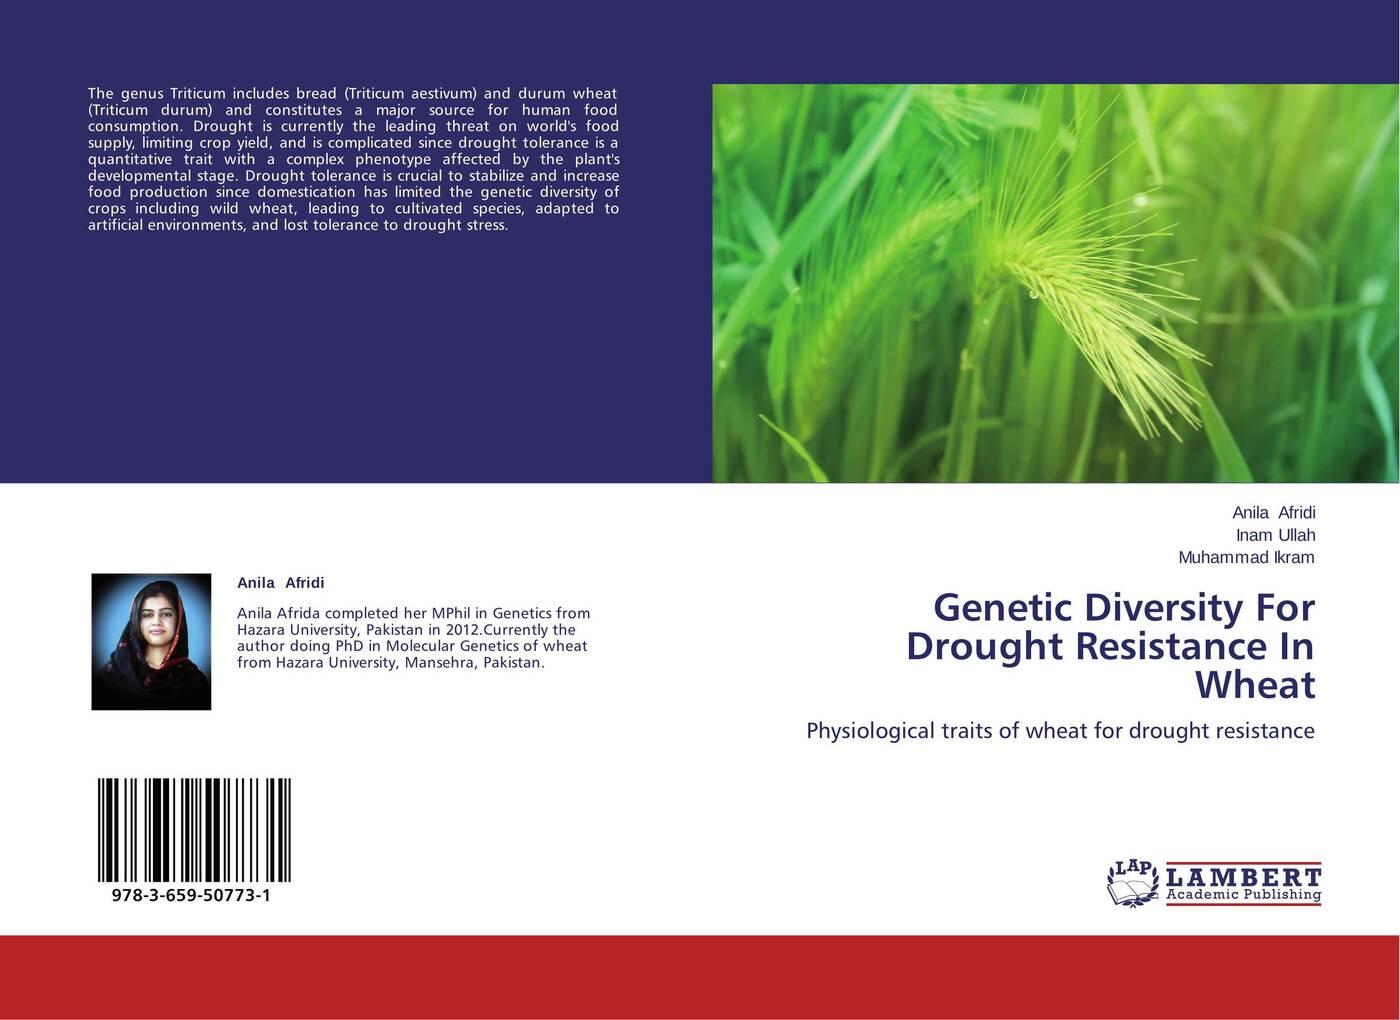 Anila Afridi,Inam Ullah and Muhammad Ikram Genetic Diversity For Drought Resistance In Wheat недорго, оригинальная цена